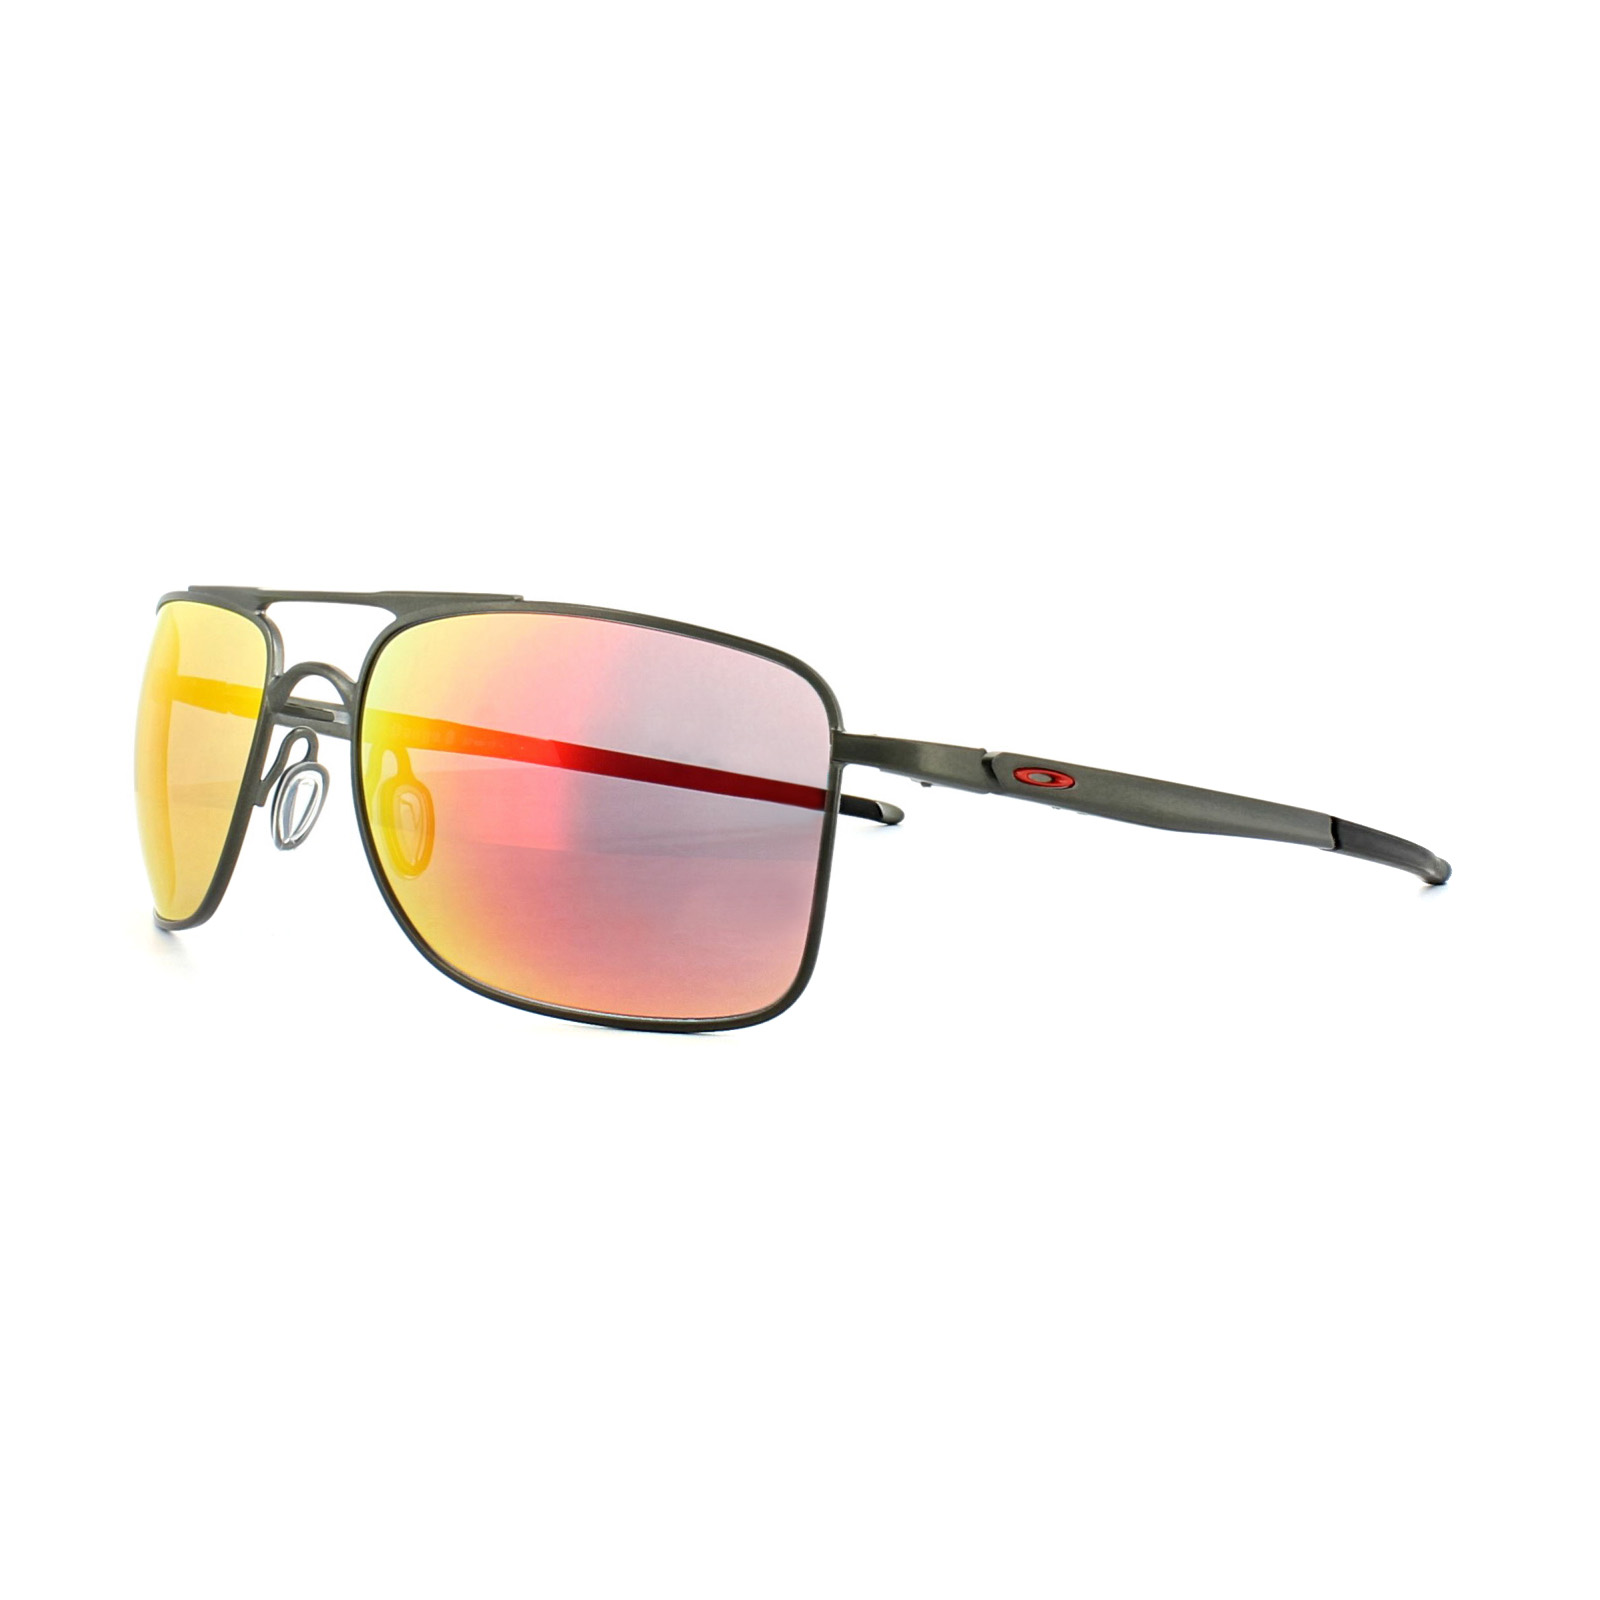 Oakley Gauge 8 >> Oakley Sunglasses Gauge 8 M Oo4124 03 Matt Carbon Ruby Iridium Ebay